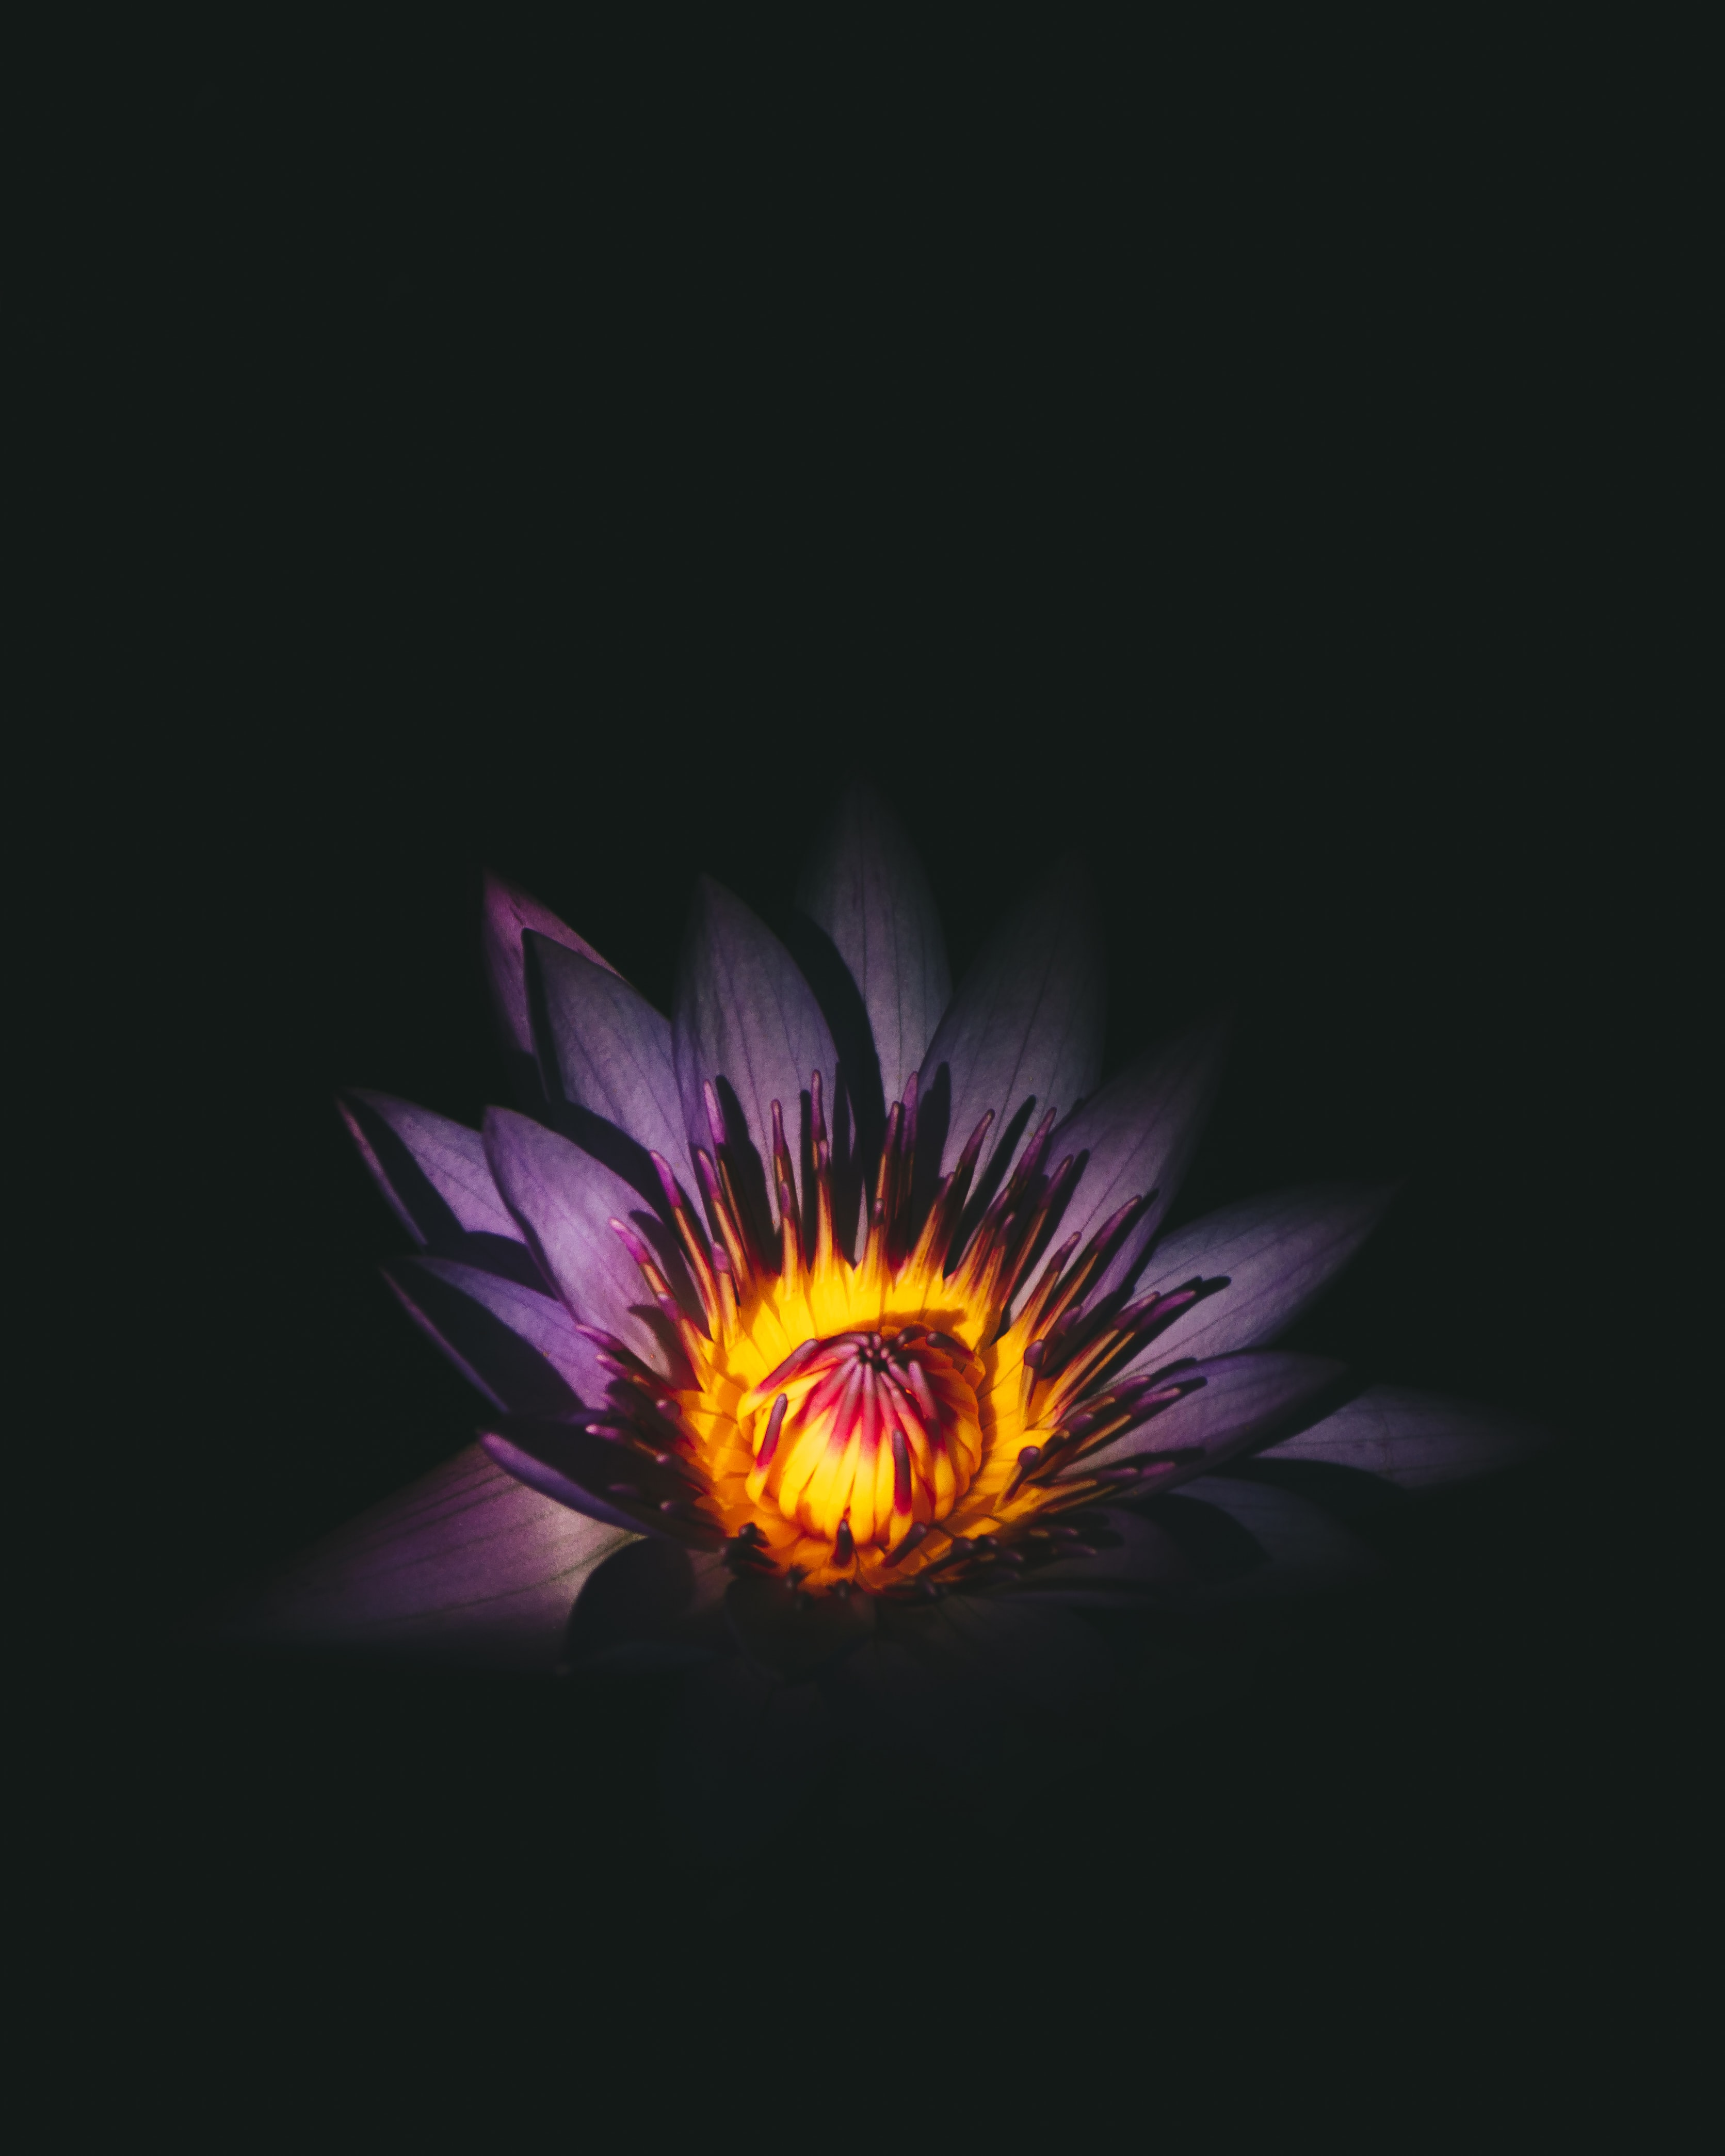 closeup photography of flower